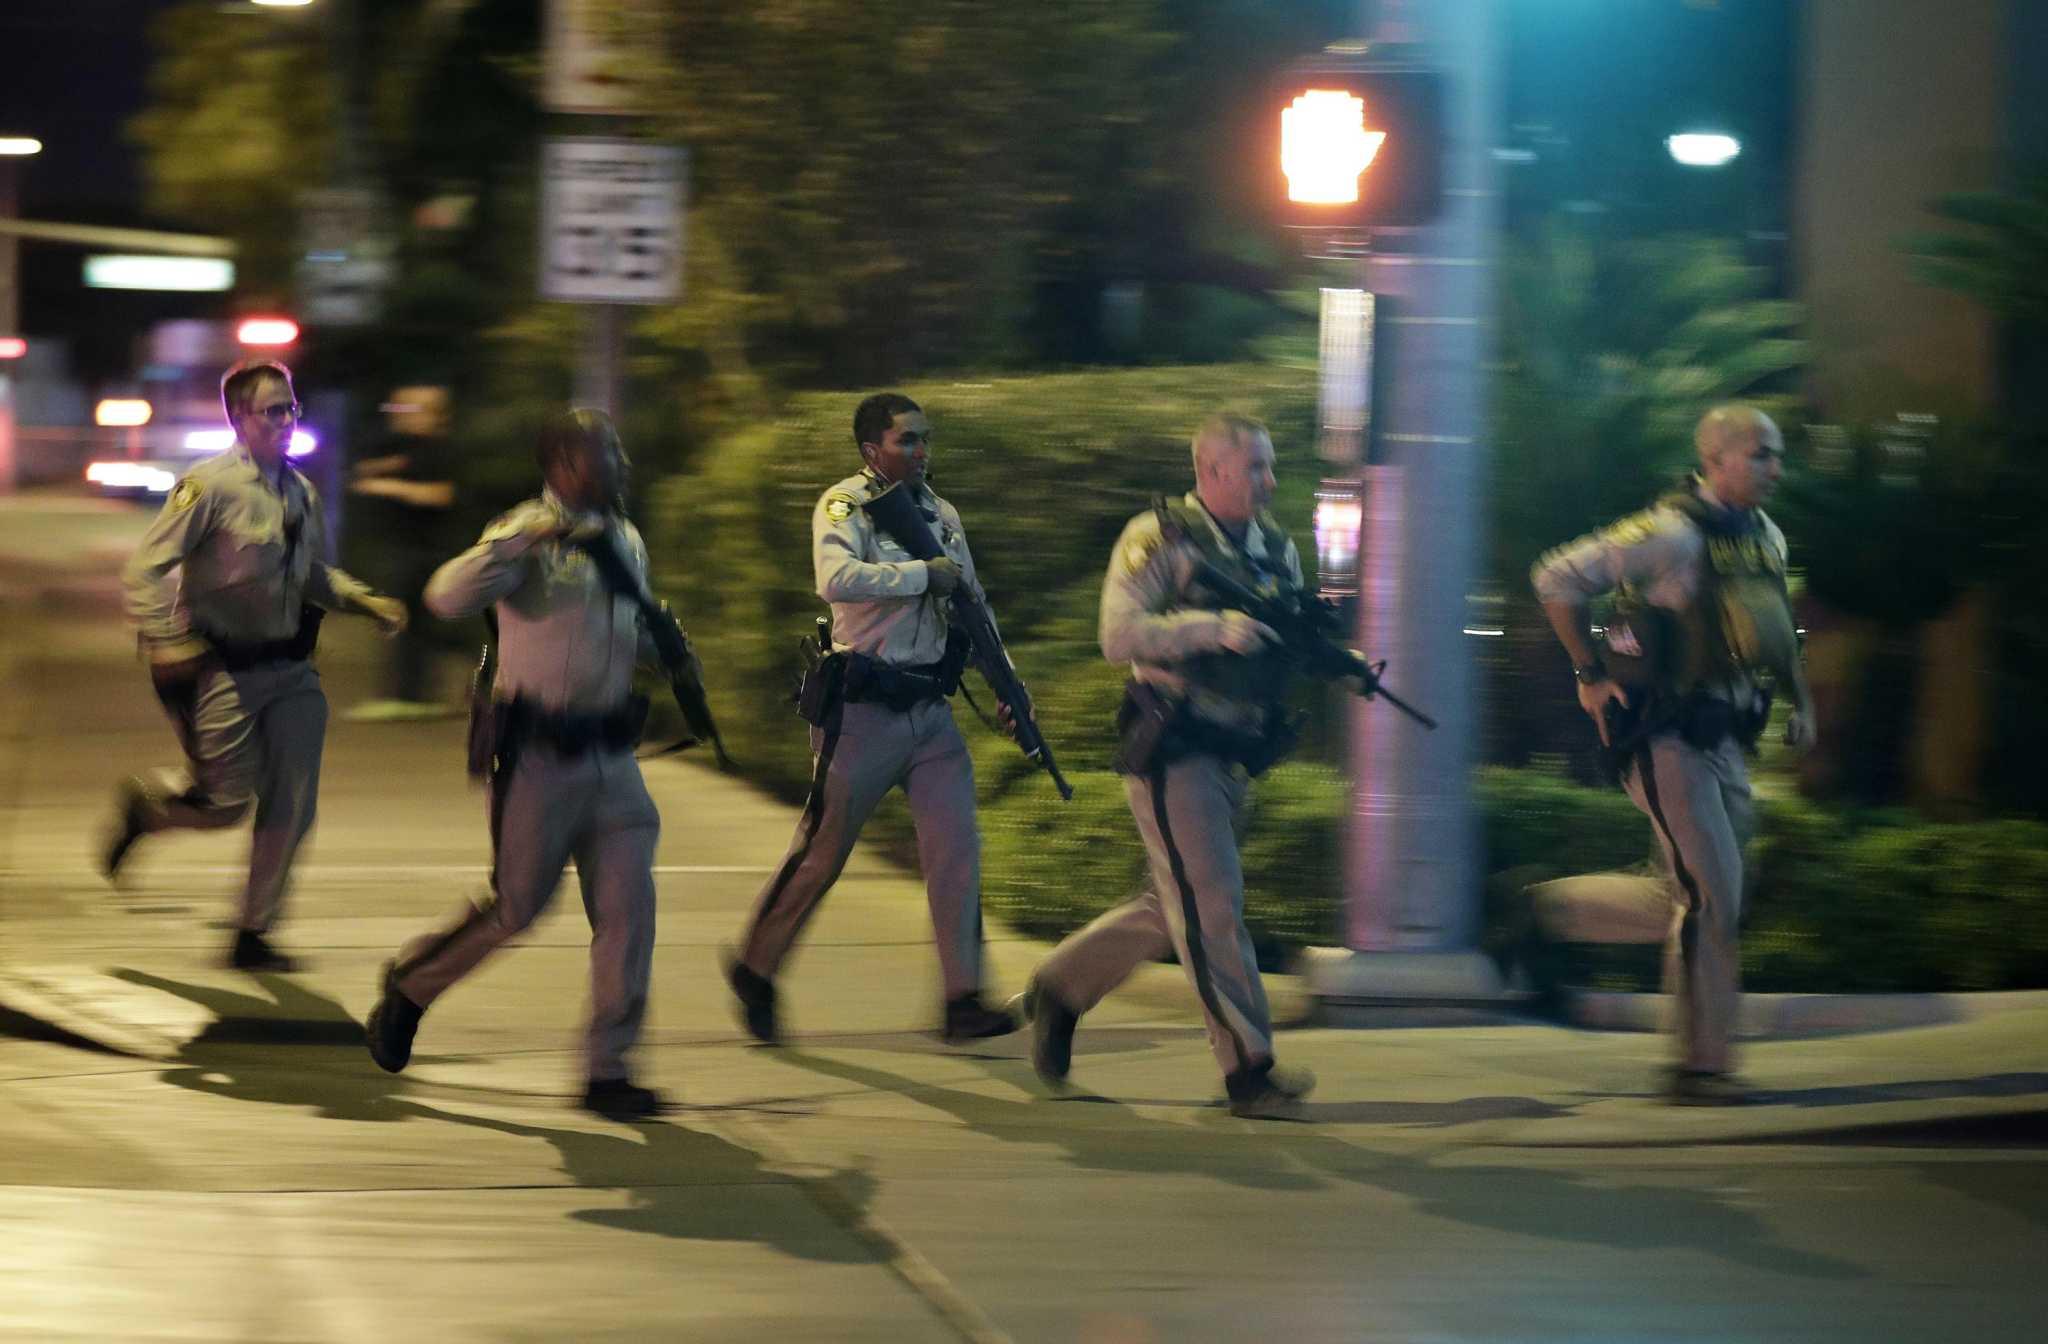 Torrington man who survived Las Vegas taking pictures alleges bosses advised him 'suck it up' thumbnail